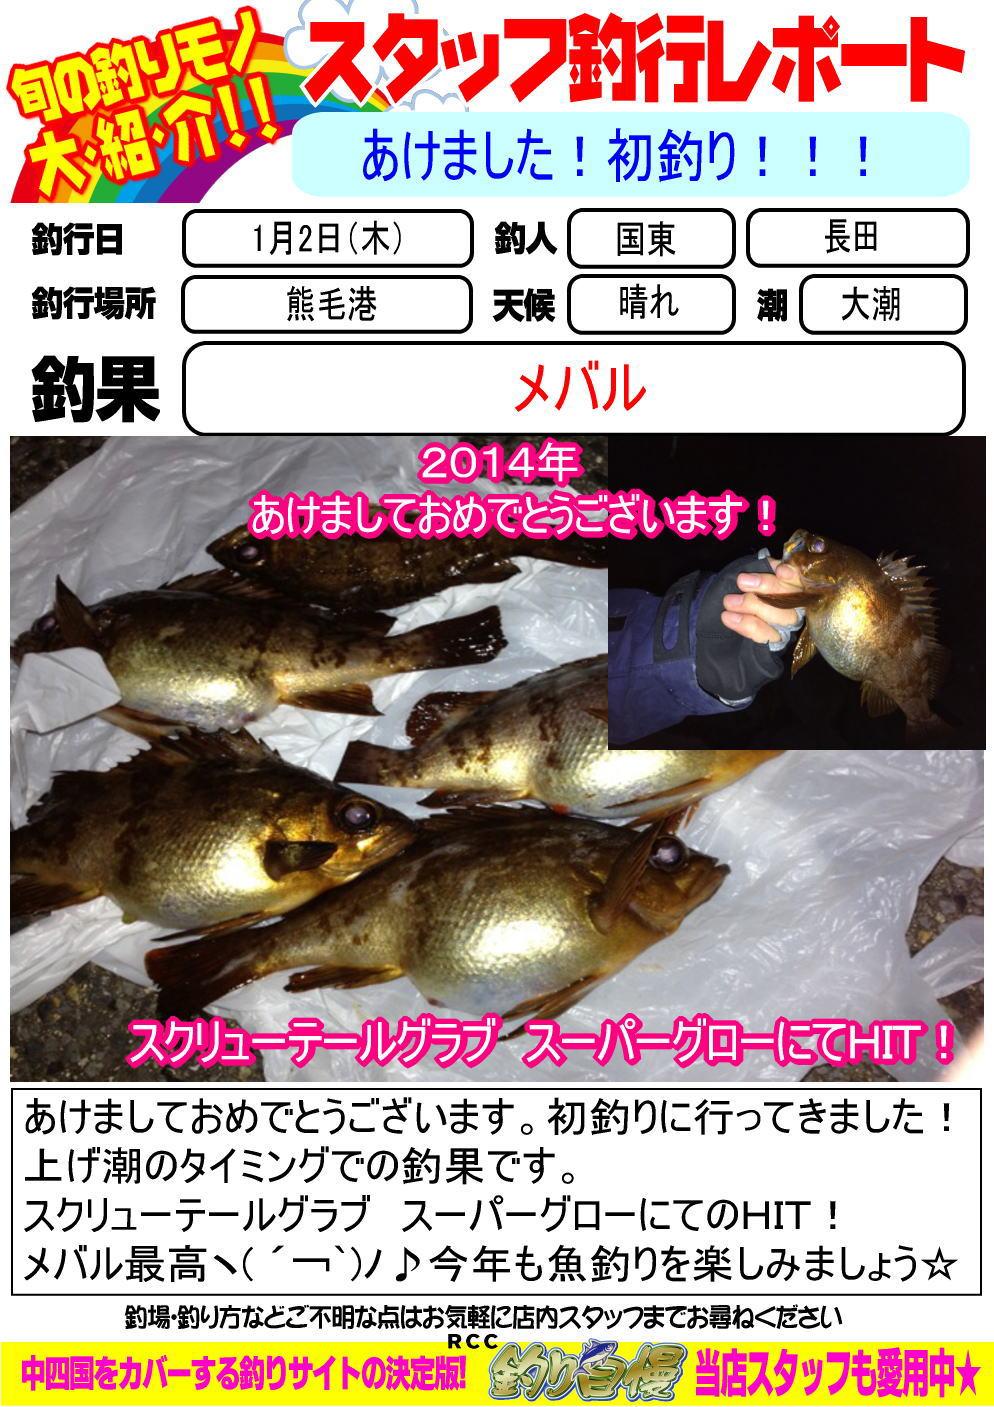 http://www.e-angle.co.jp/shop/blog/blog-20140102-kunisaki-mebaruu.jpg